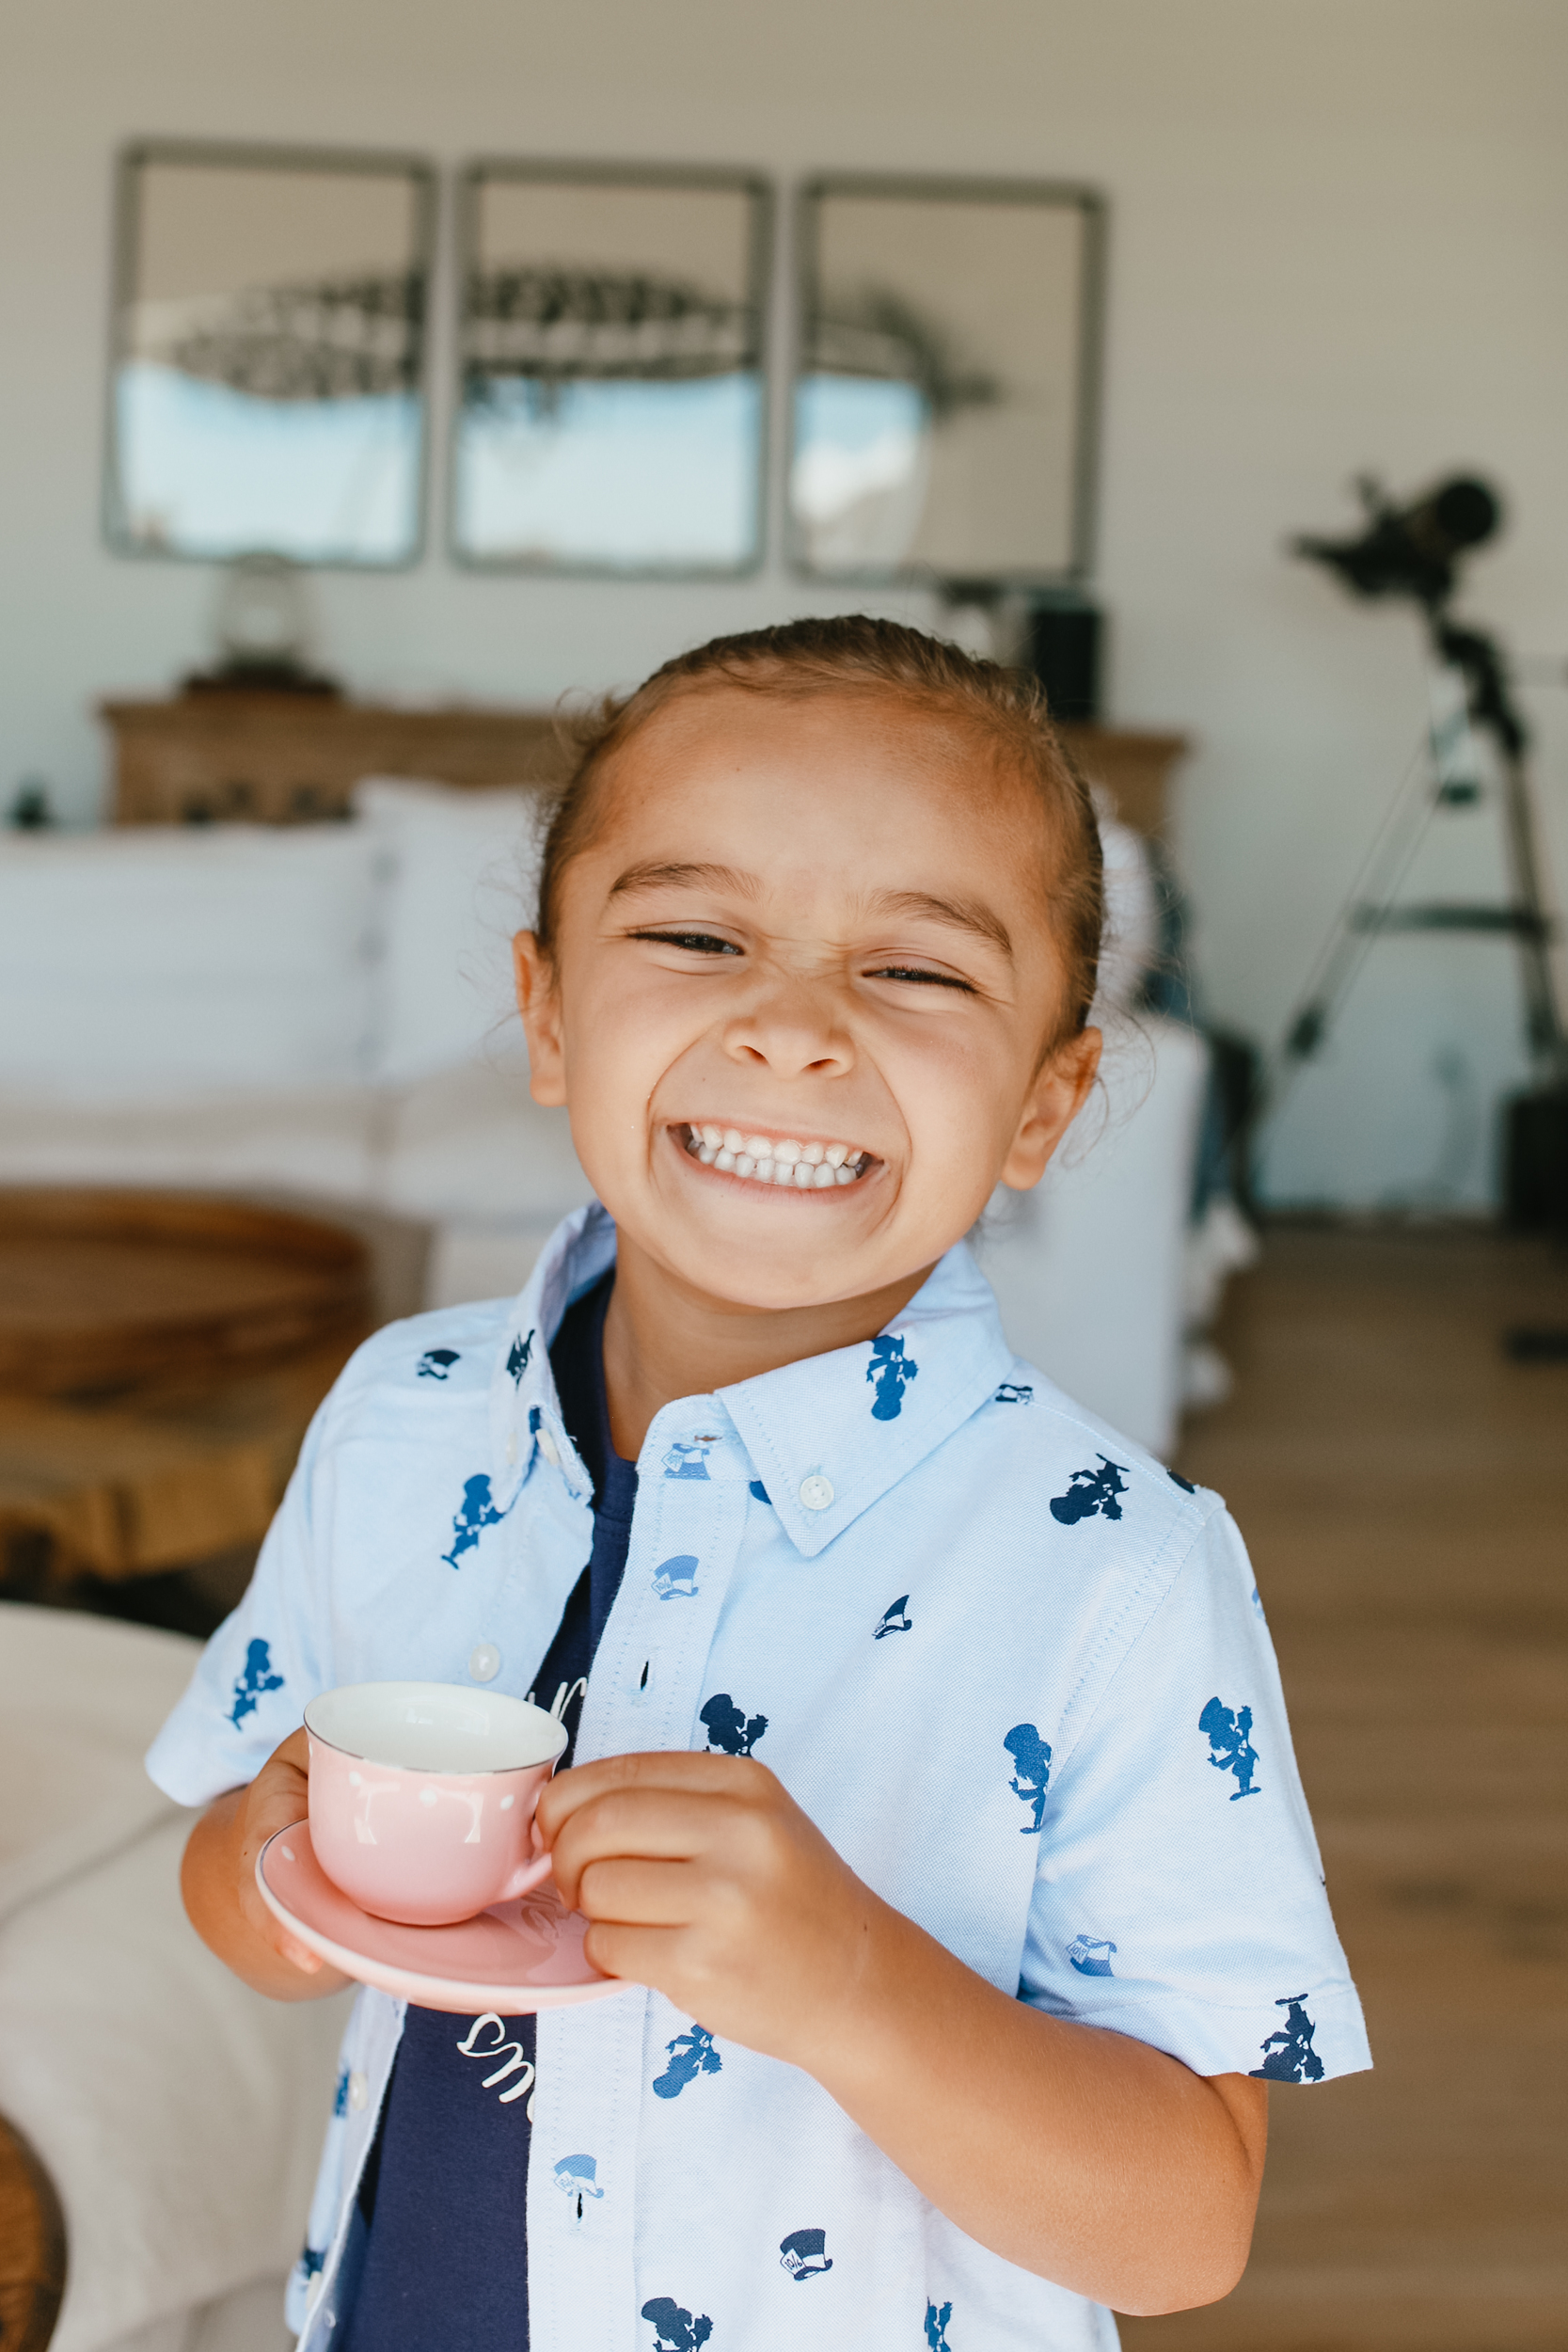 grinning little boy